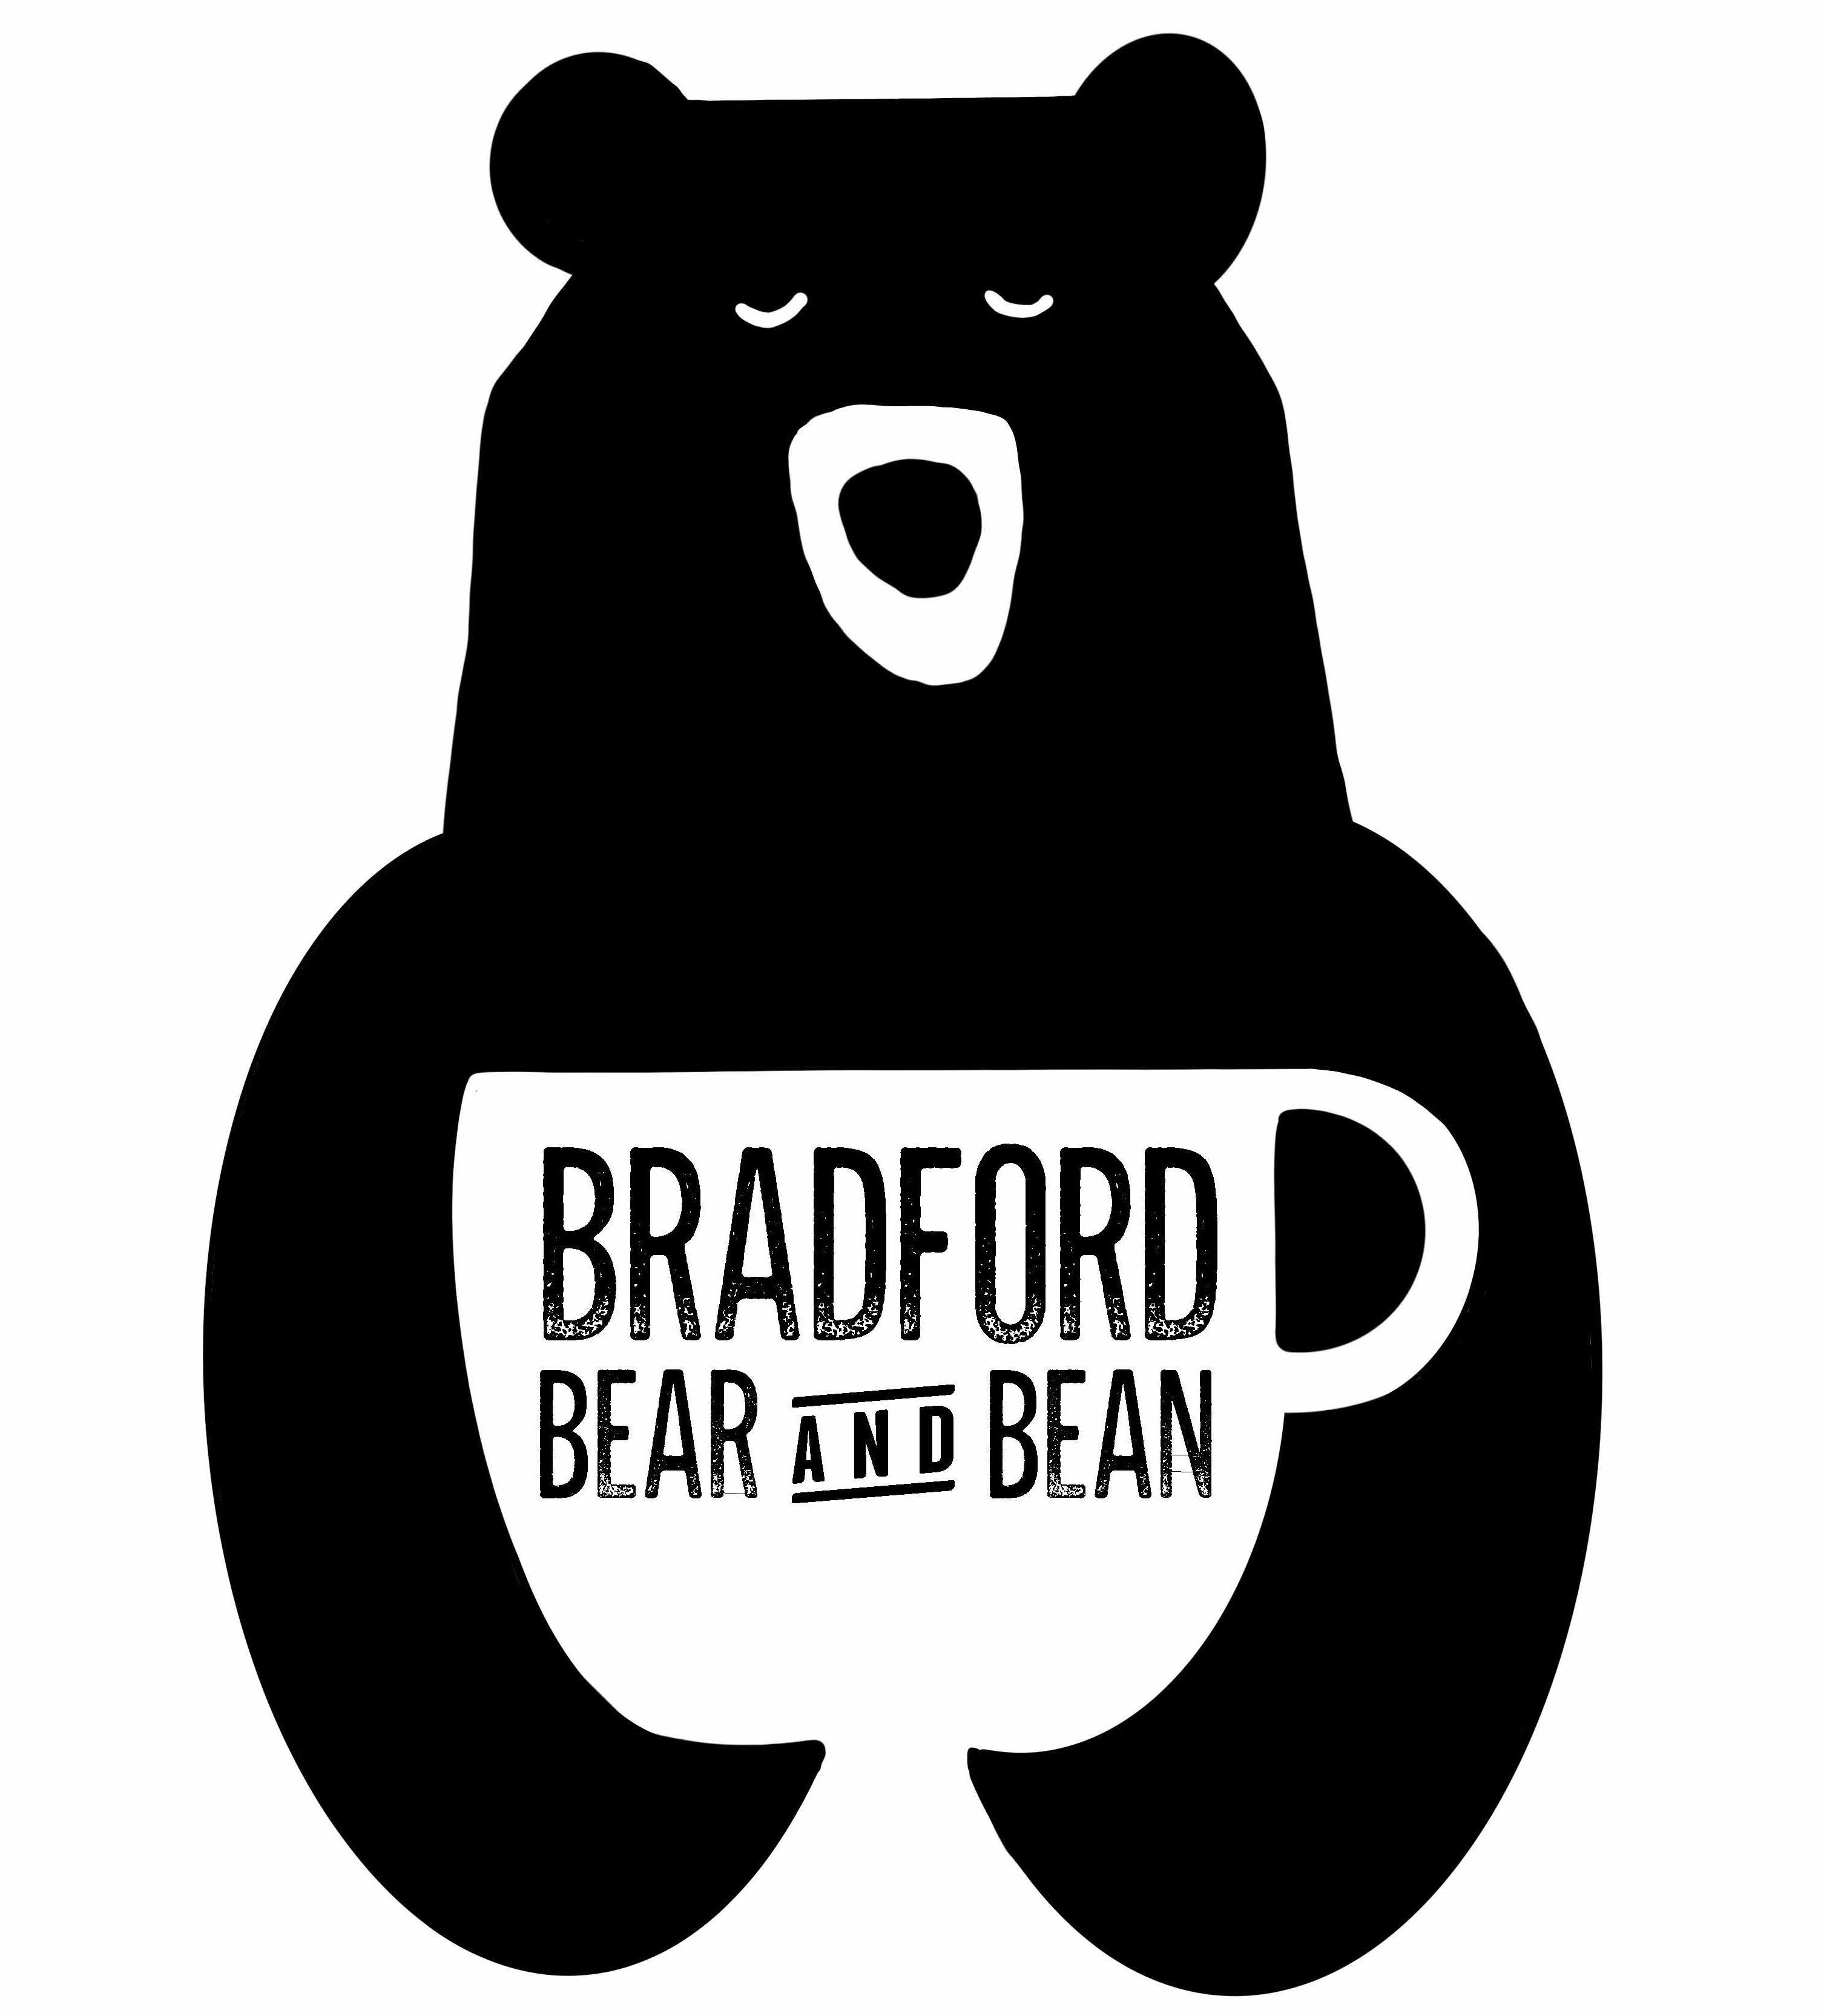 Bradford Bear and Bean Cropped.jpg